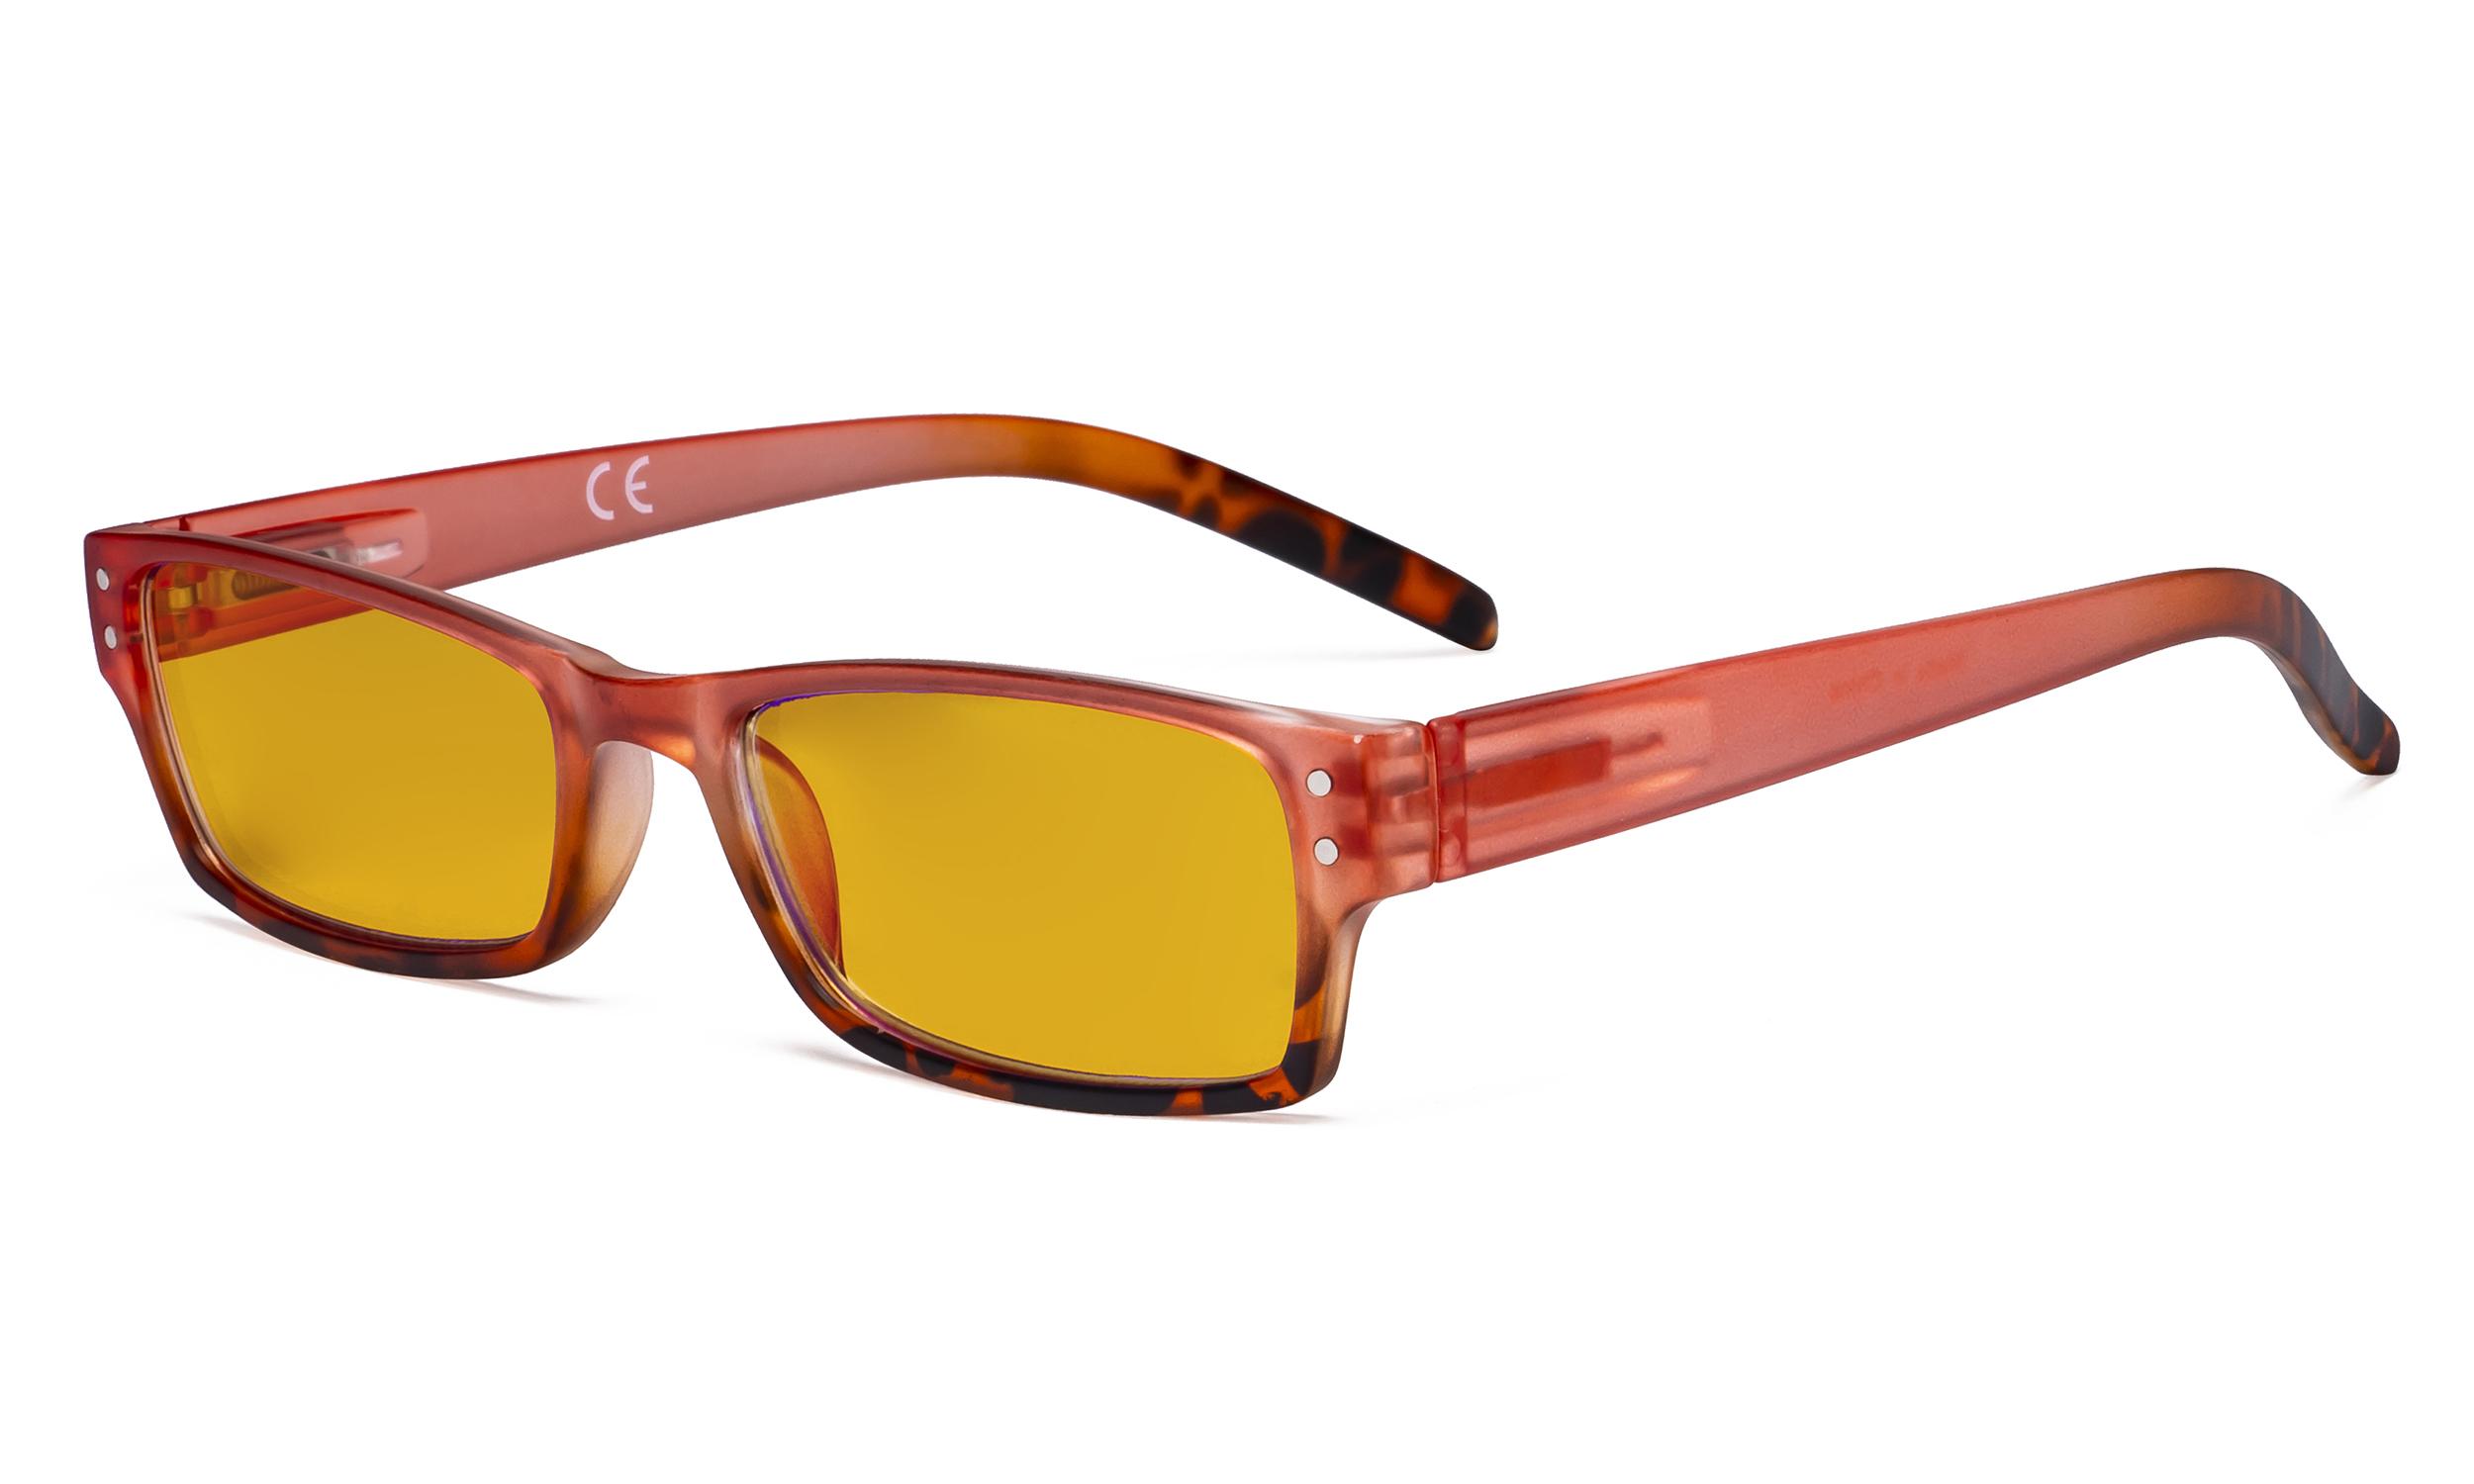 Eyekepper Blue Light Blocking Glasses with Amber Filter ...